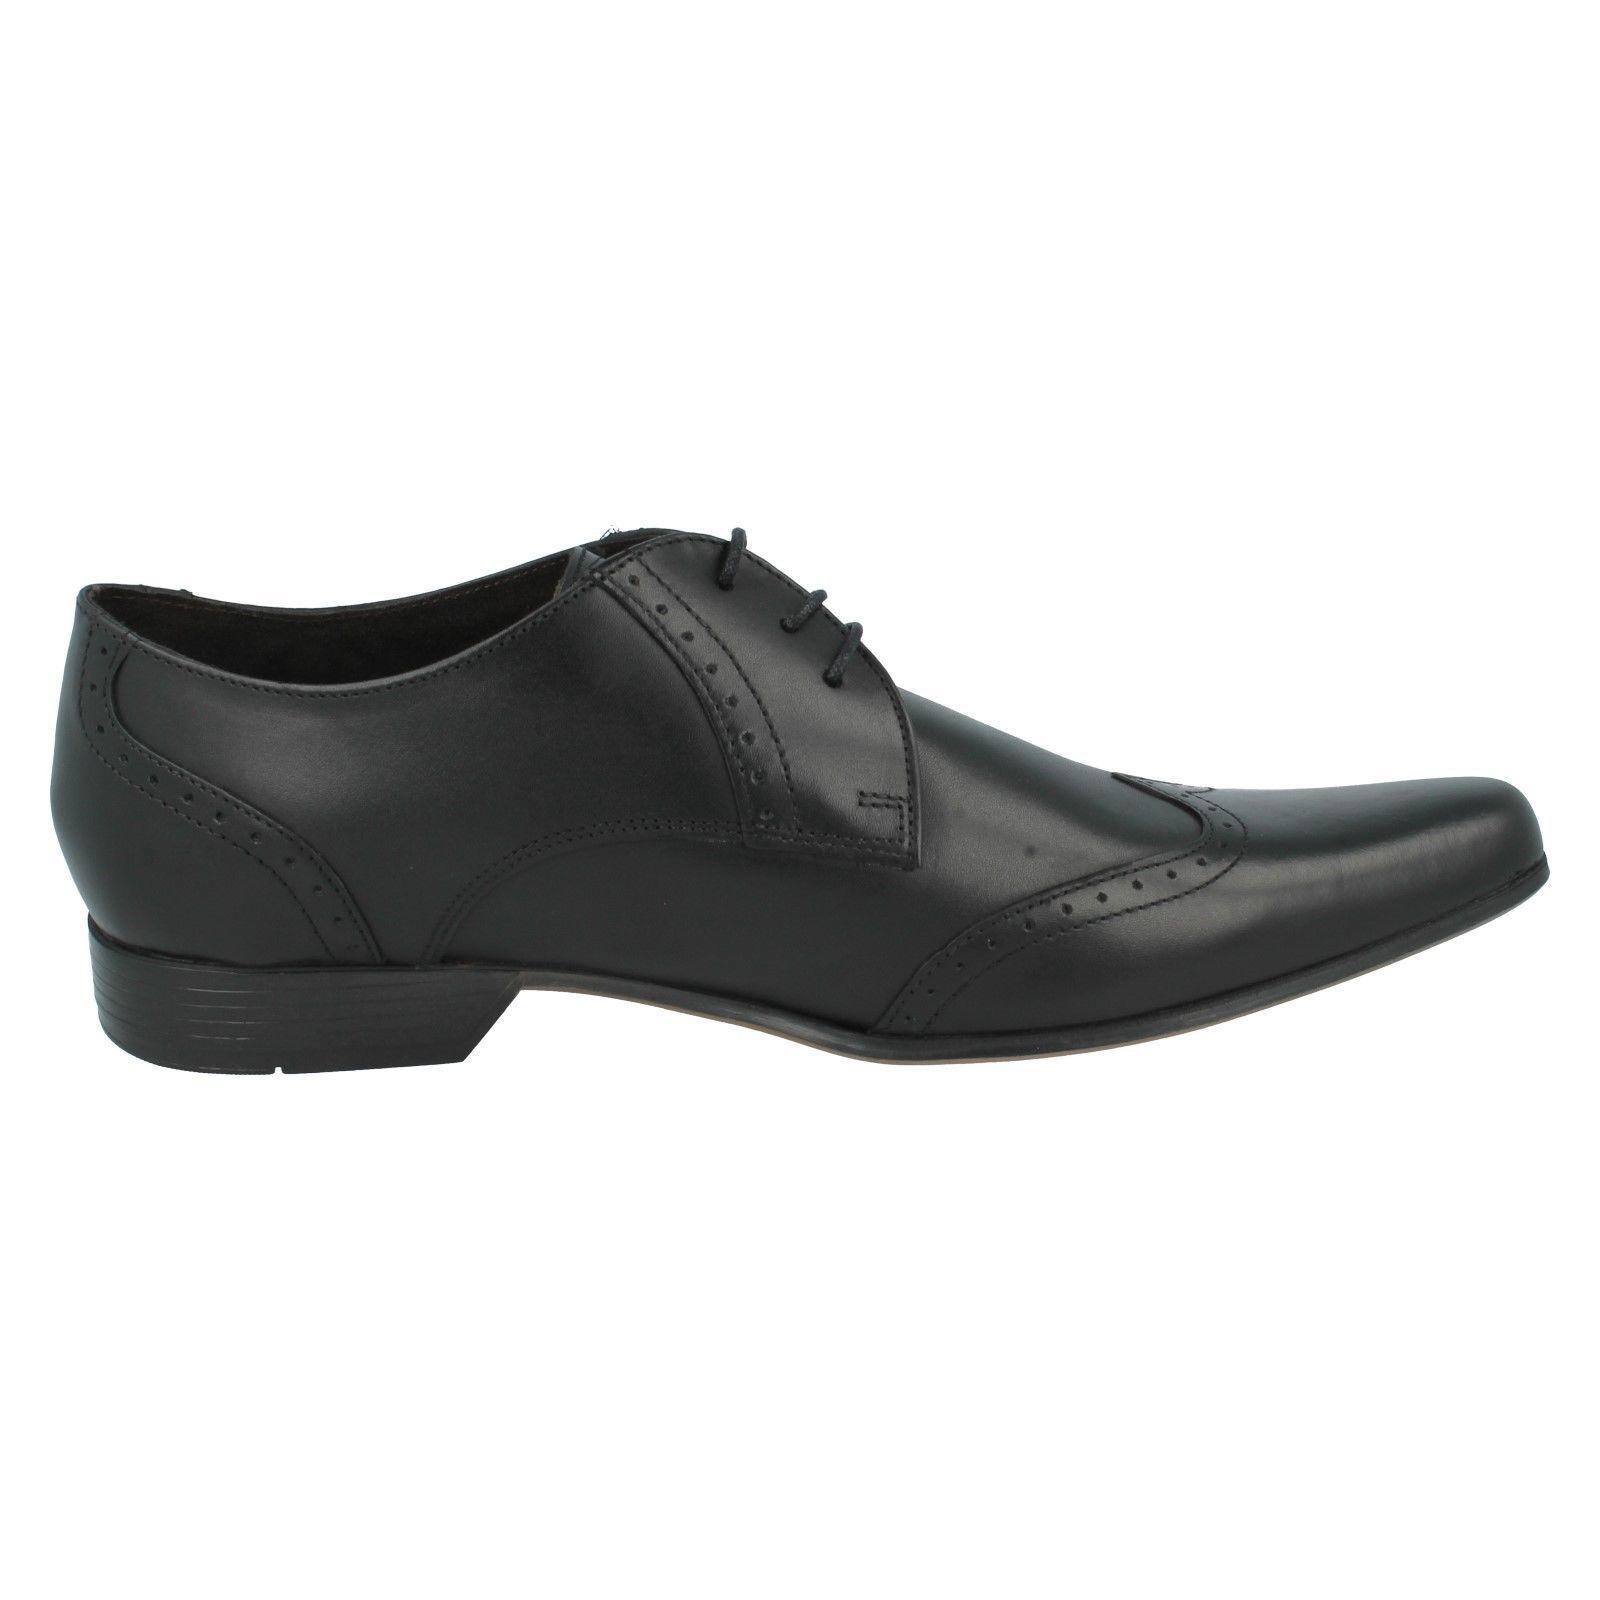 BASE LONDON  Herren Herren Herren BUGSY MTO LACE UP SQUARE TOE LEATHER SEMI BROGUE FORMAL Schuhe 4c42b8